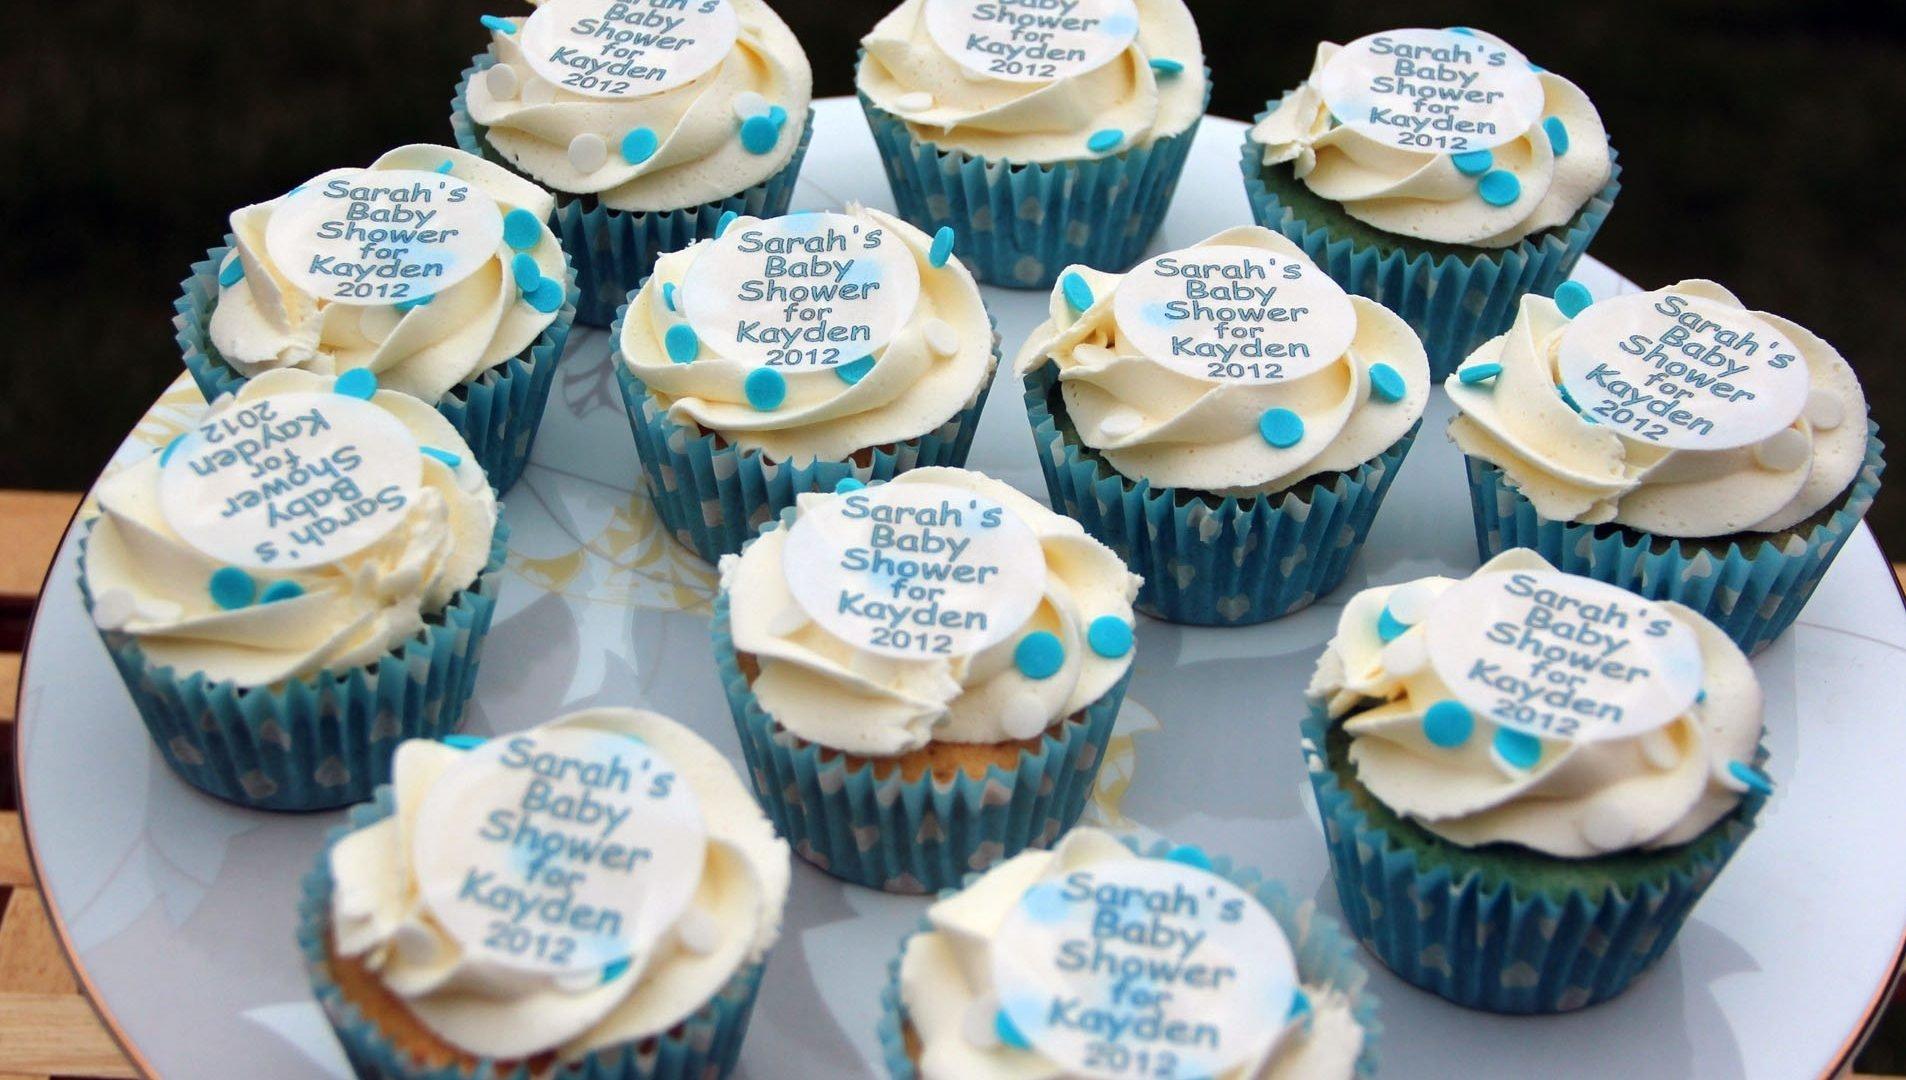 10 Fantastic Boy Baby Shower Cupcake Ideas baby shower cupcake cake ideas boy literarywondrous cakes x girl